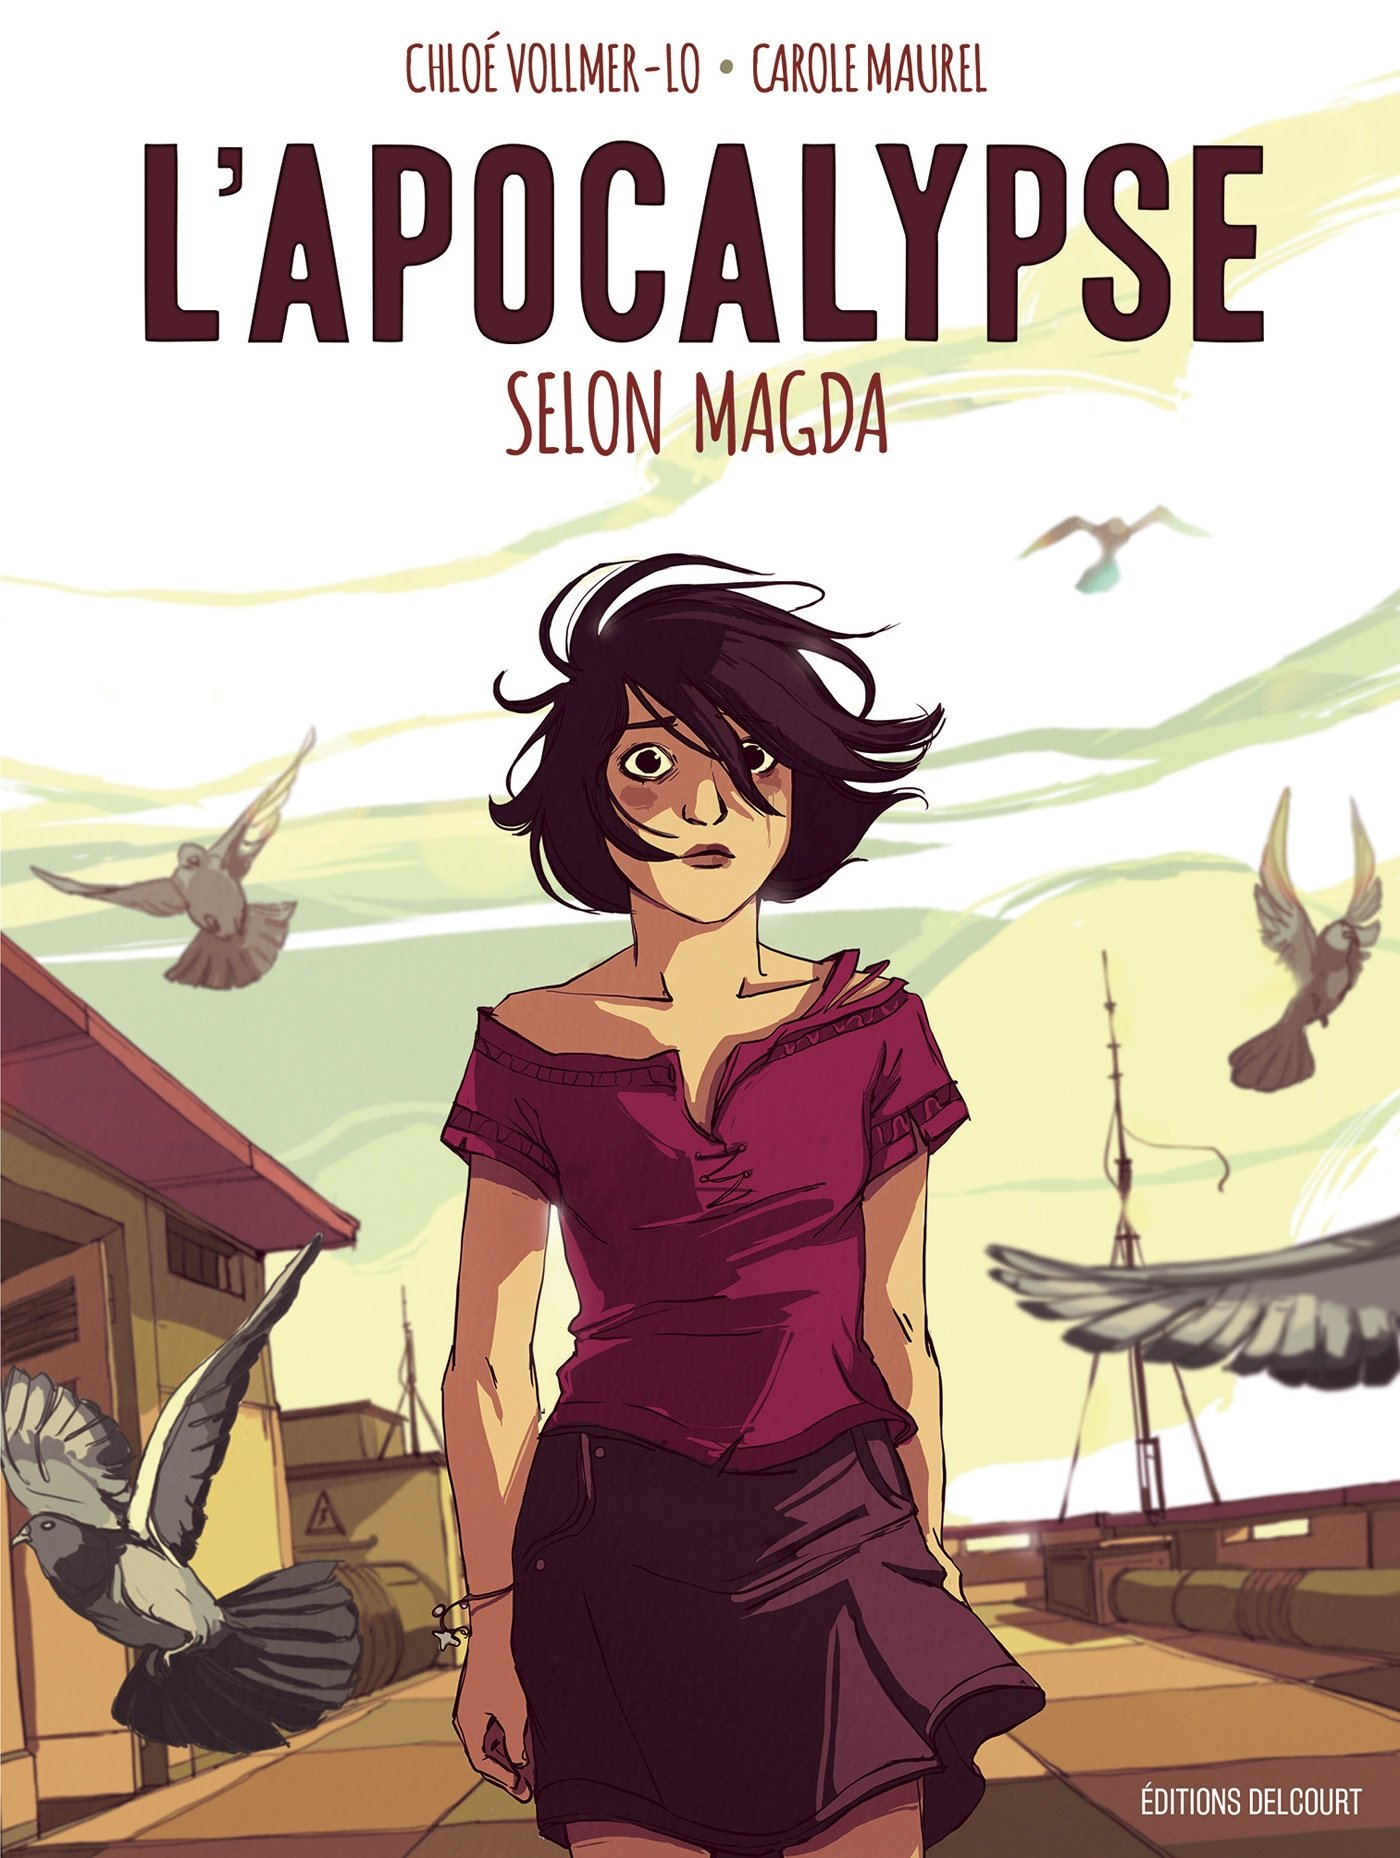 Amazon.fr - L'Apocalypse selon Magda - Vollmer-Lo, Chloé, Maurel, Carole -  Livres